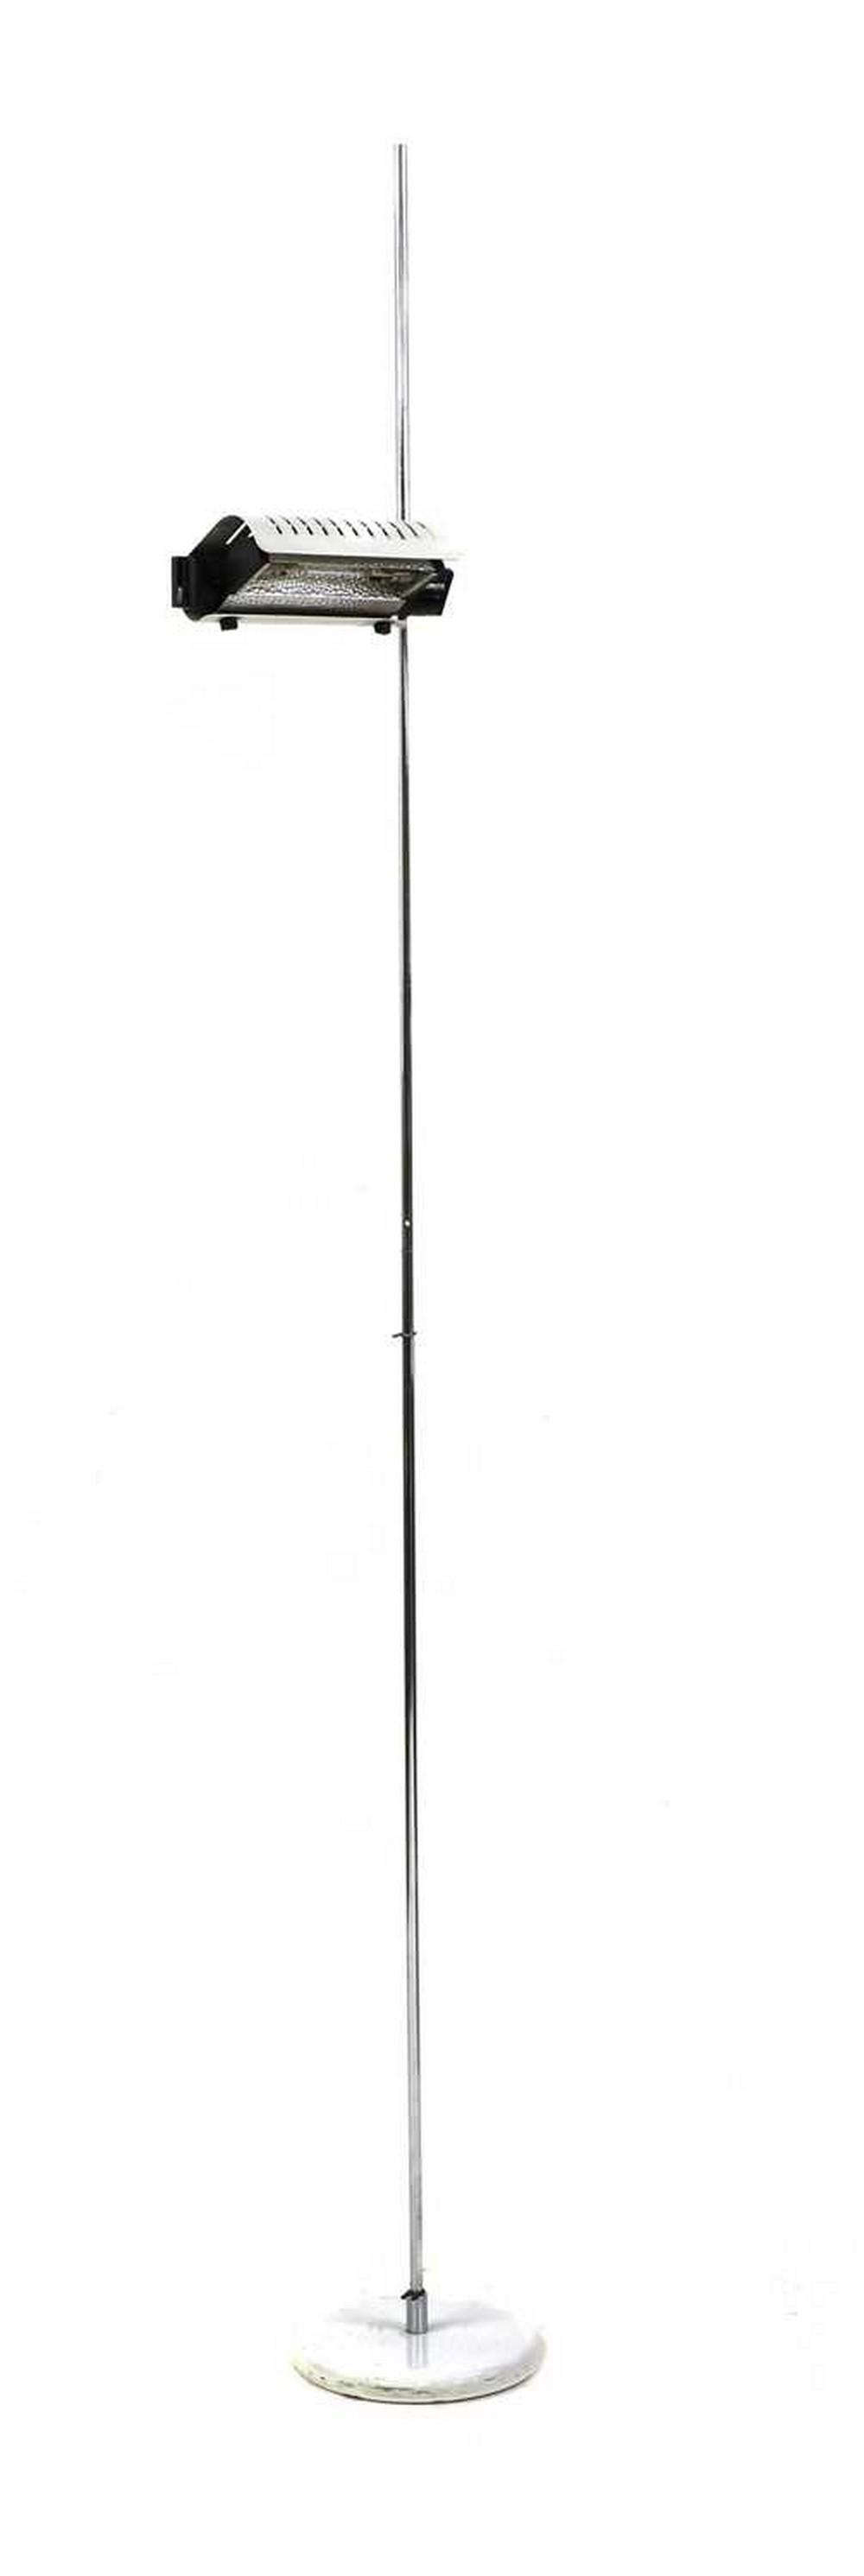 A 'Model 626' floor lamp,